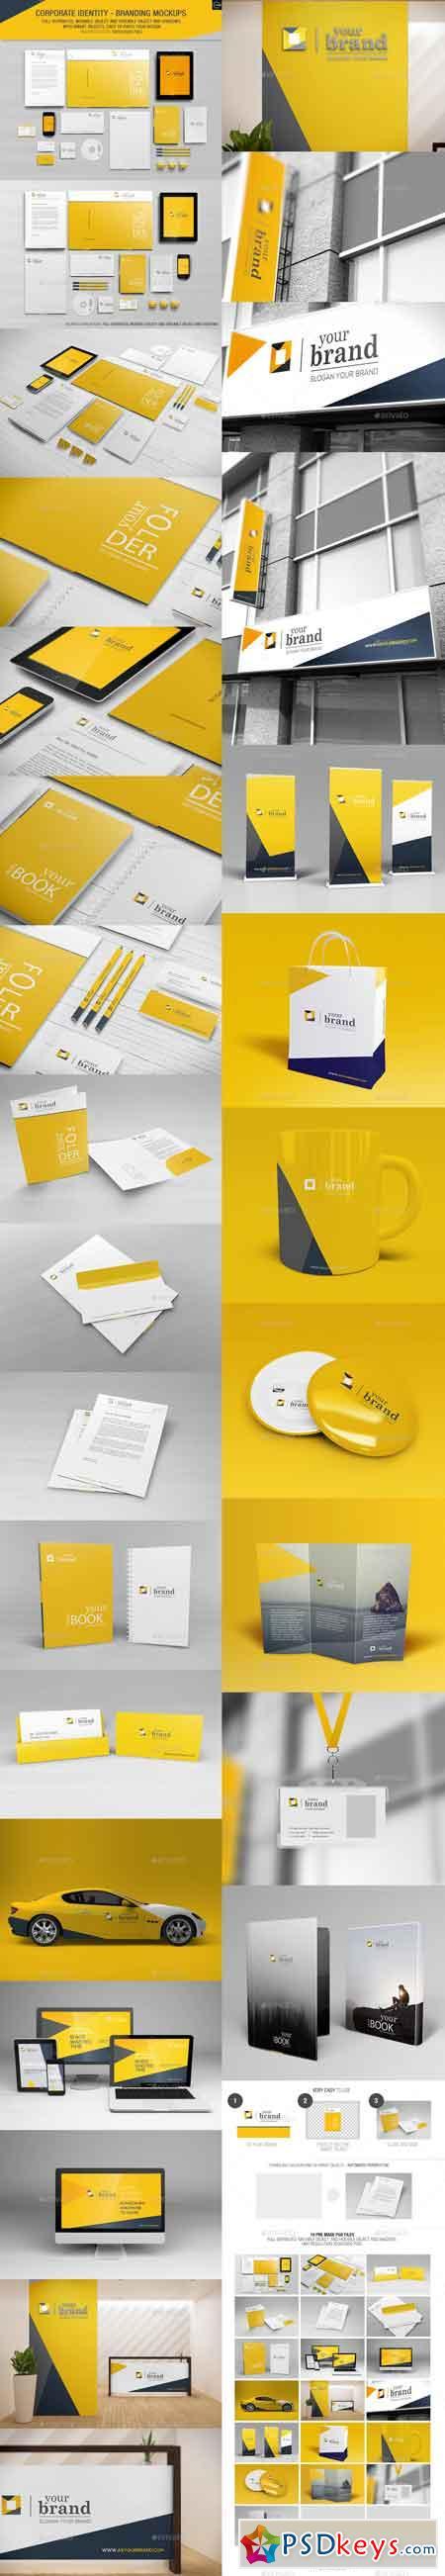 Corporate Identity - Branding Mockups 6944354